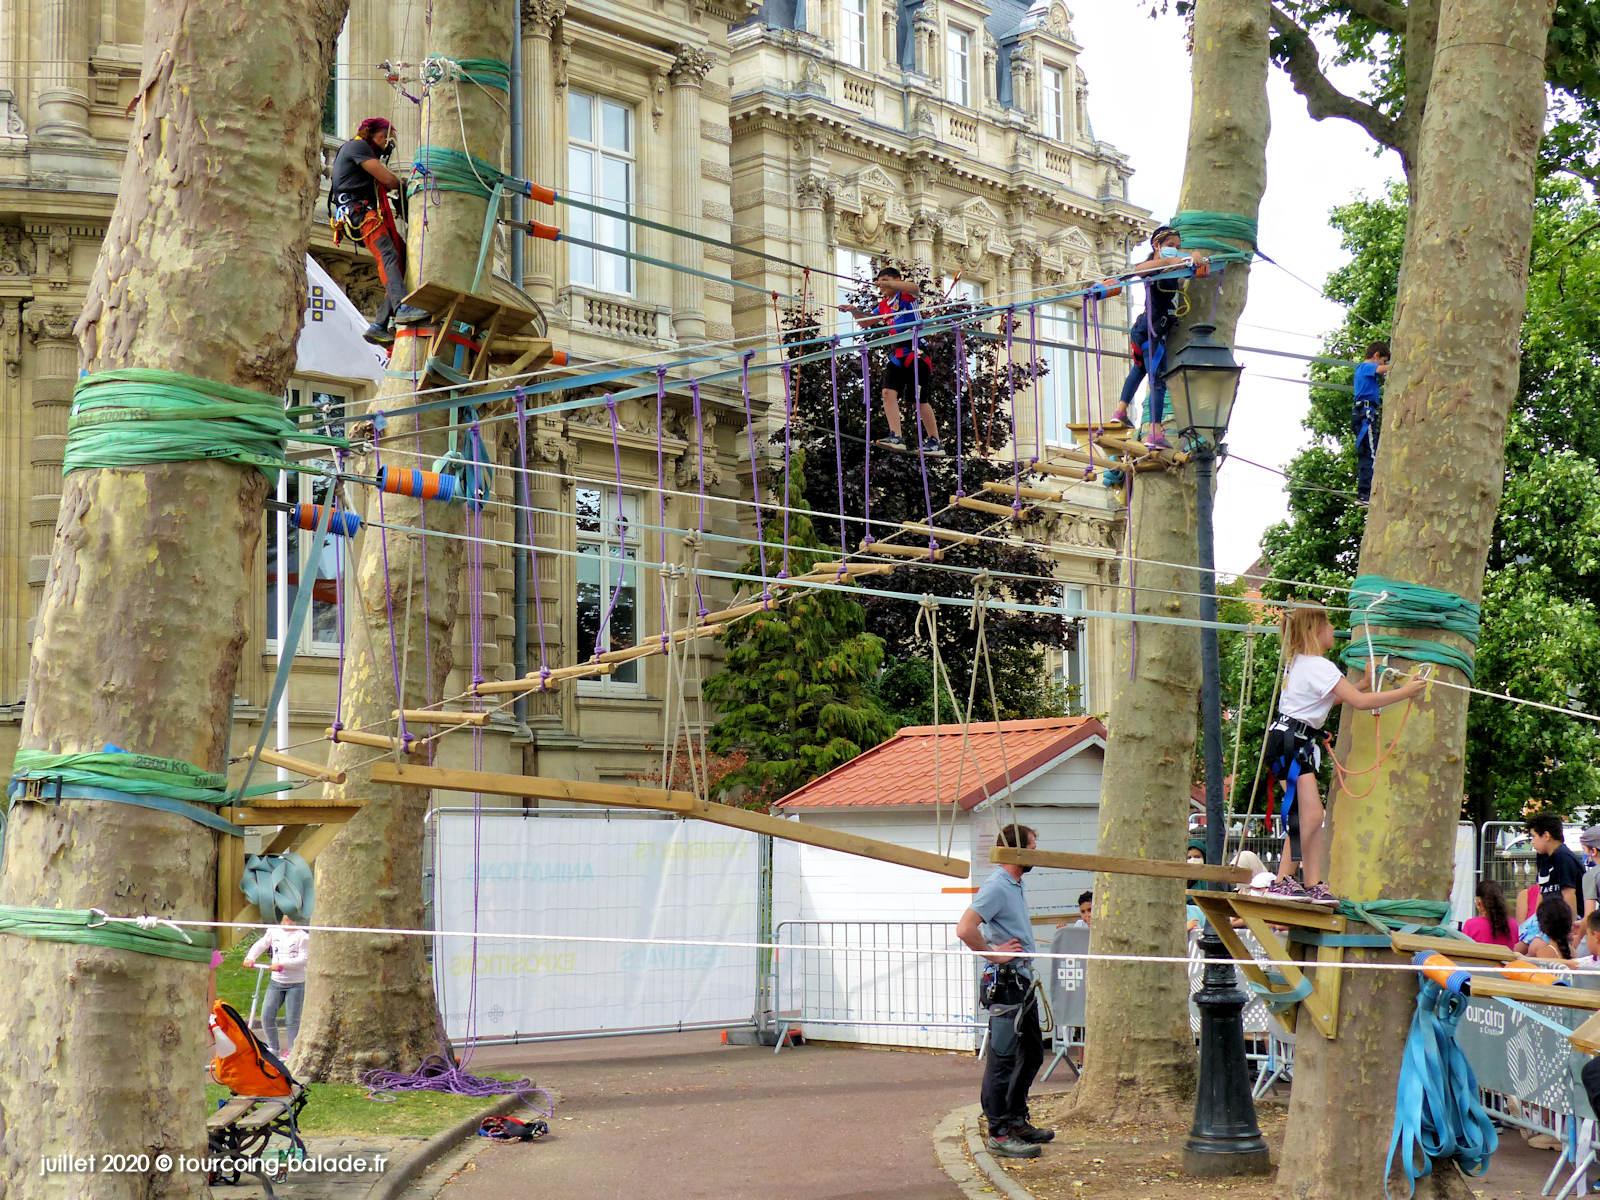 Accrobranche Square Churchill, Tourcoing 2020